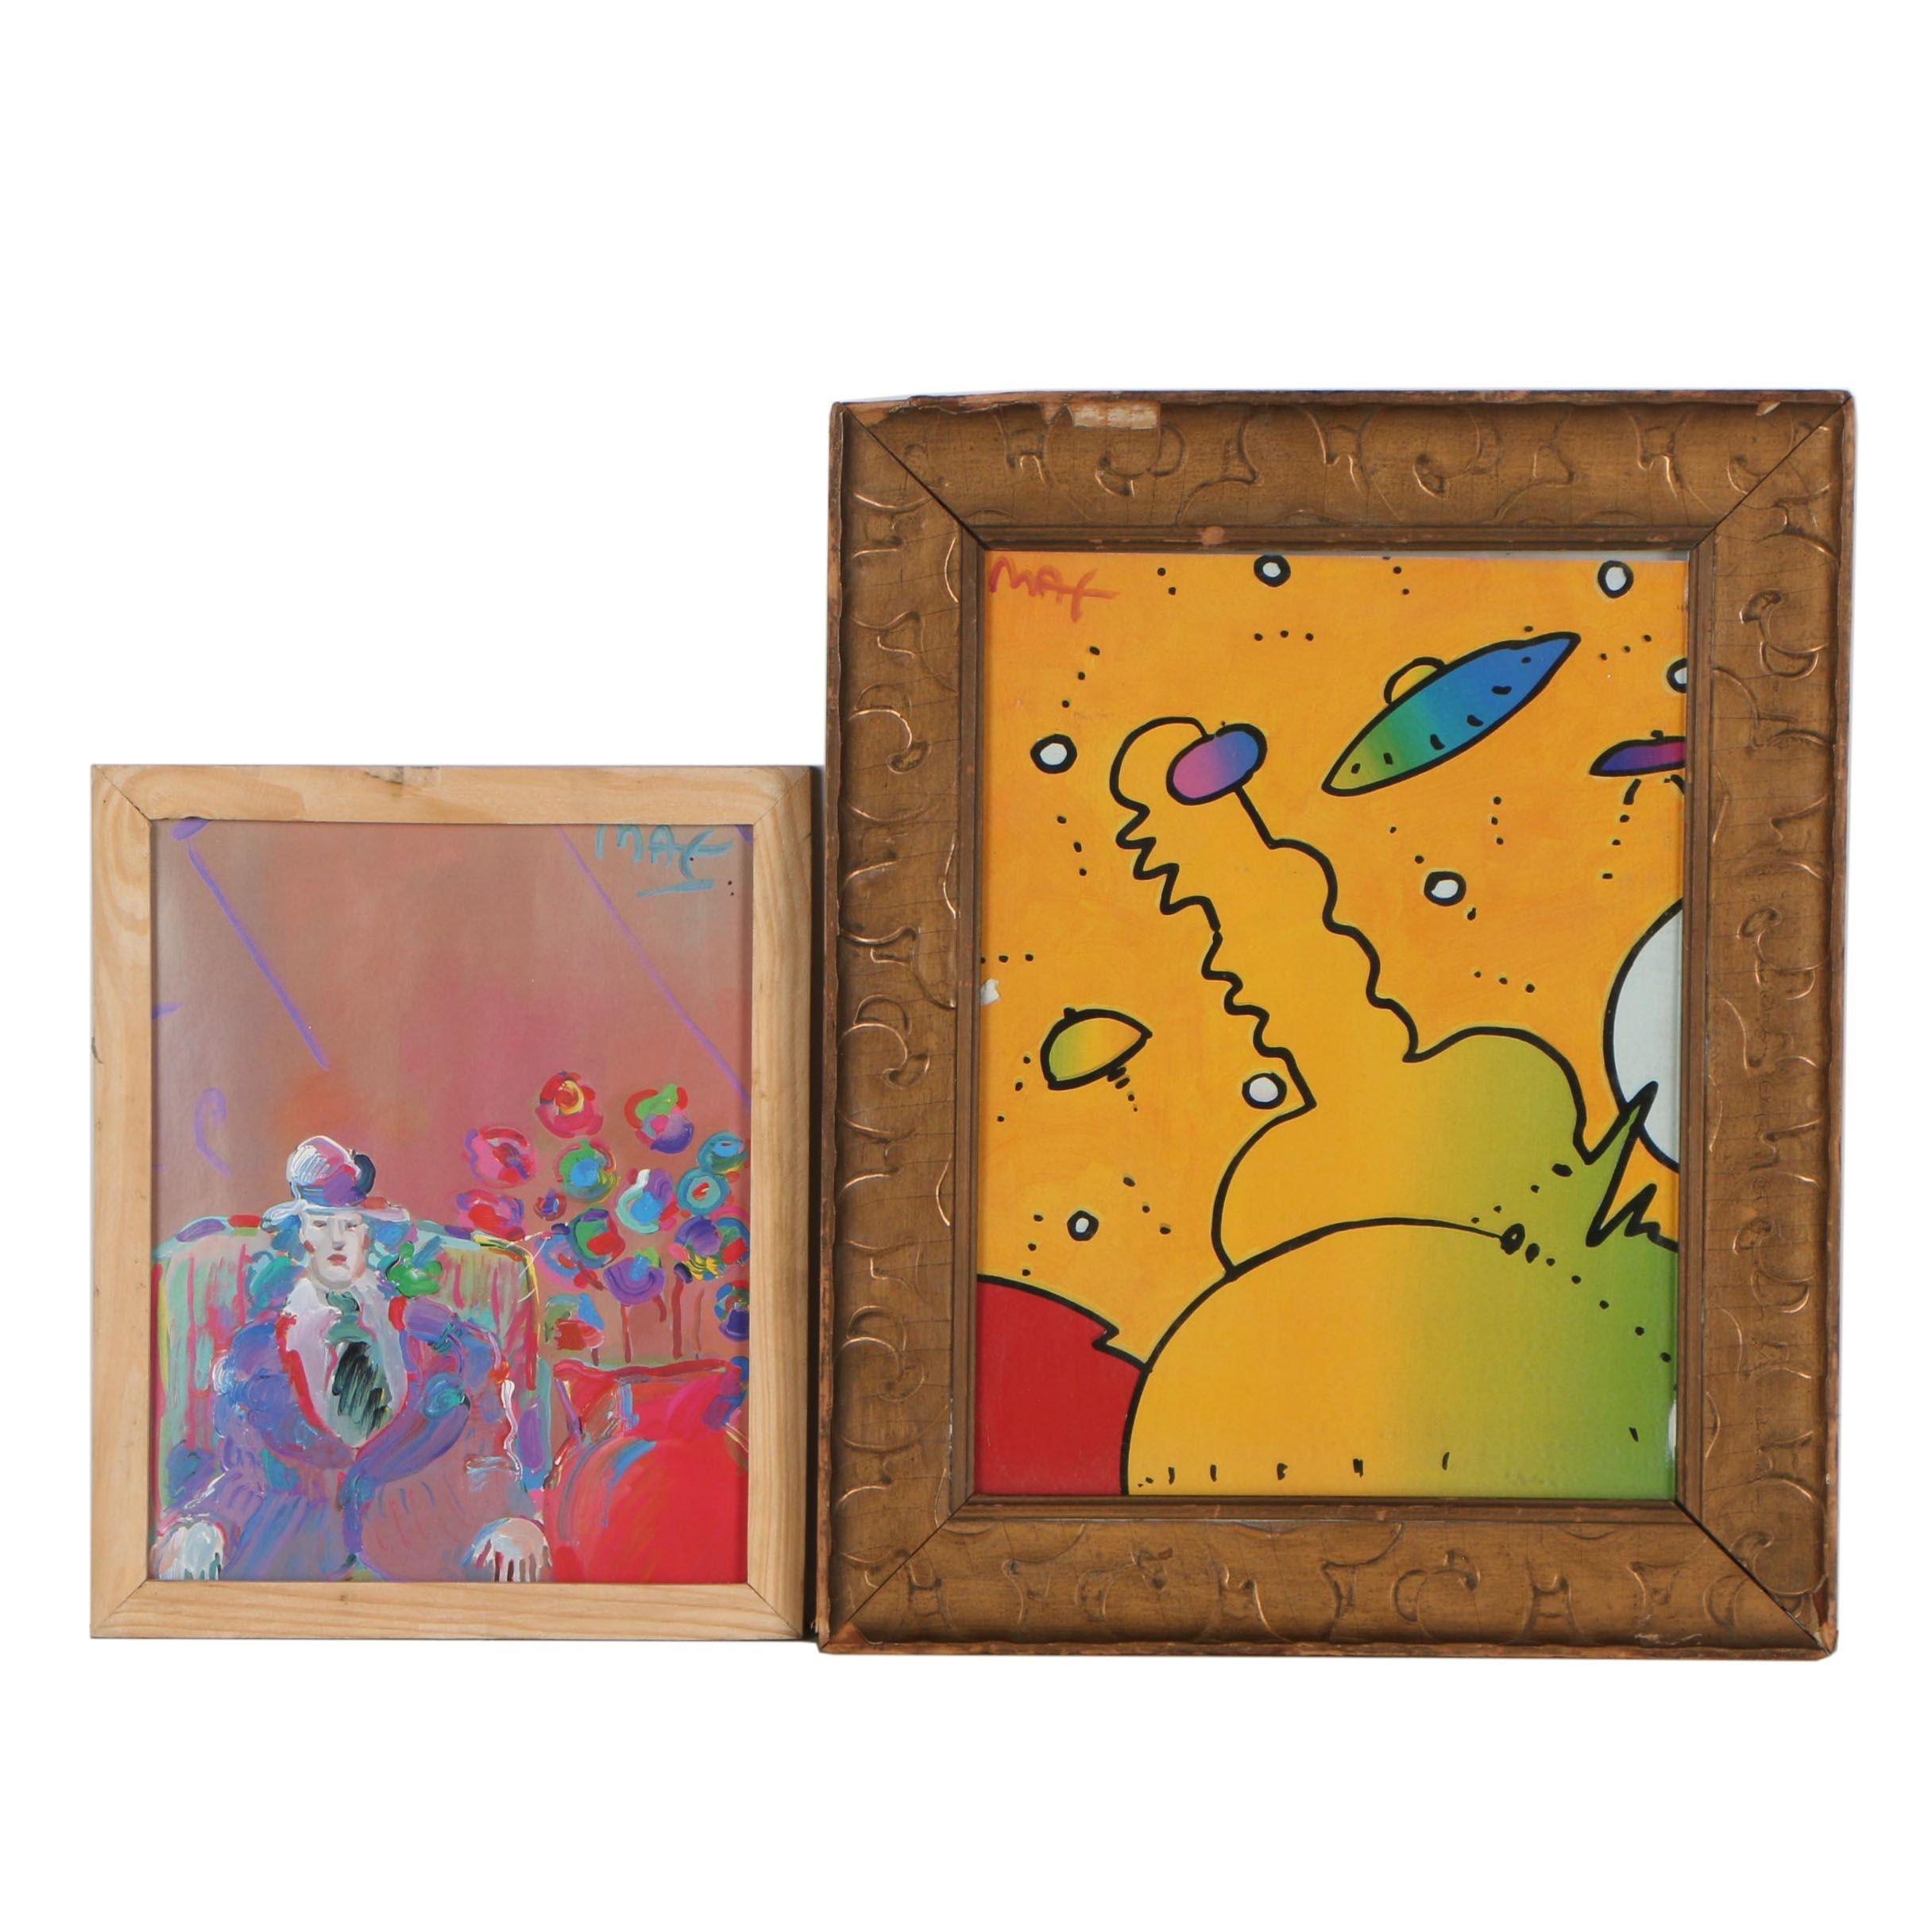 Offset Lithographs after Peter Max